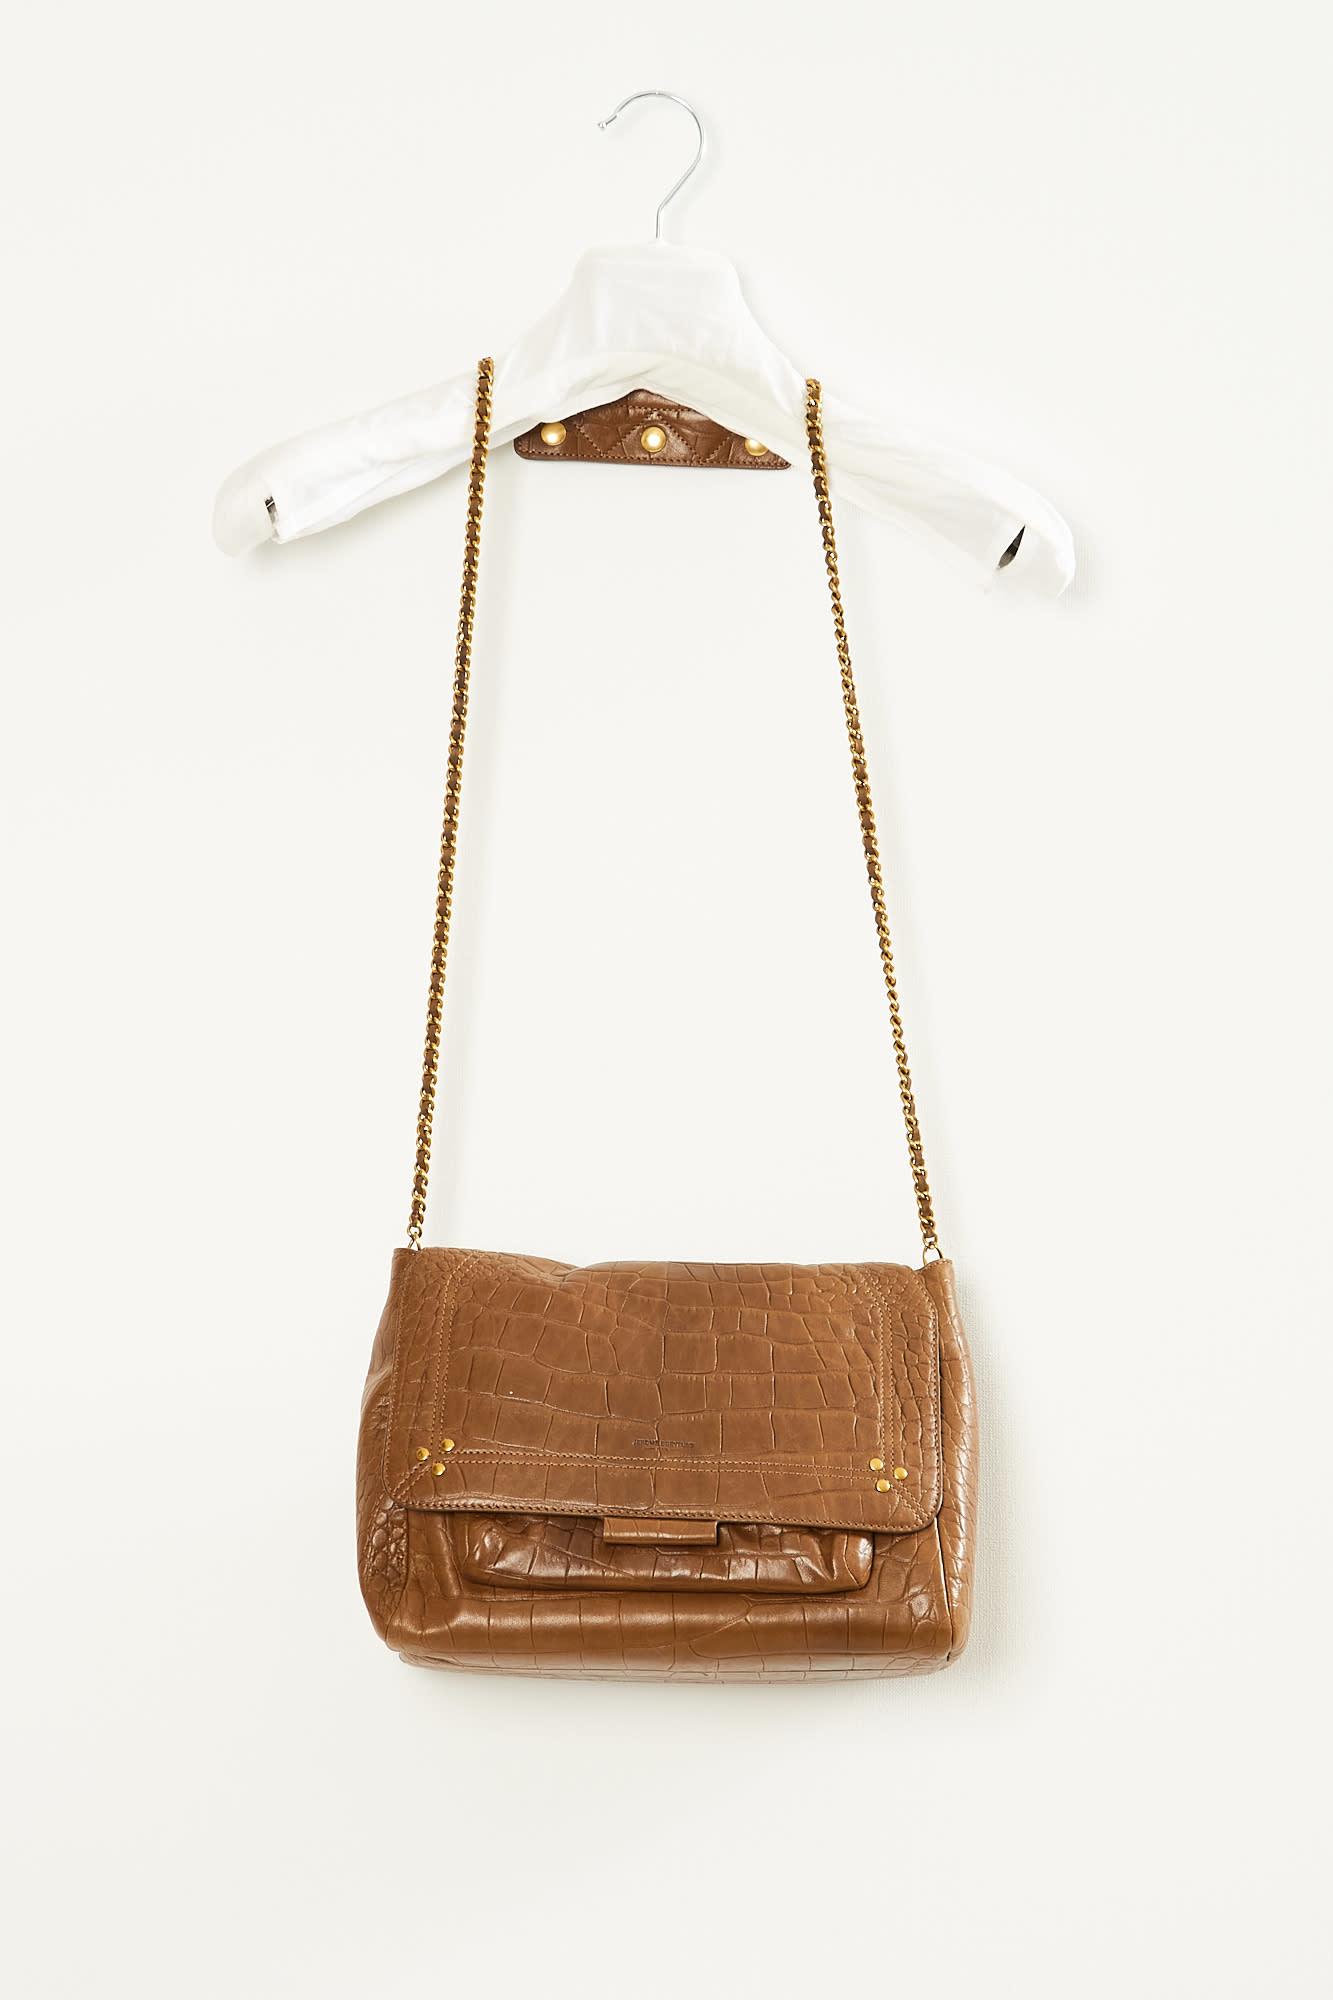 Jerome Dreyfuss - Lulu lamb and goat leather handbag